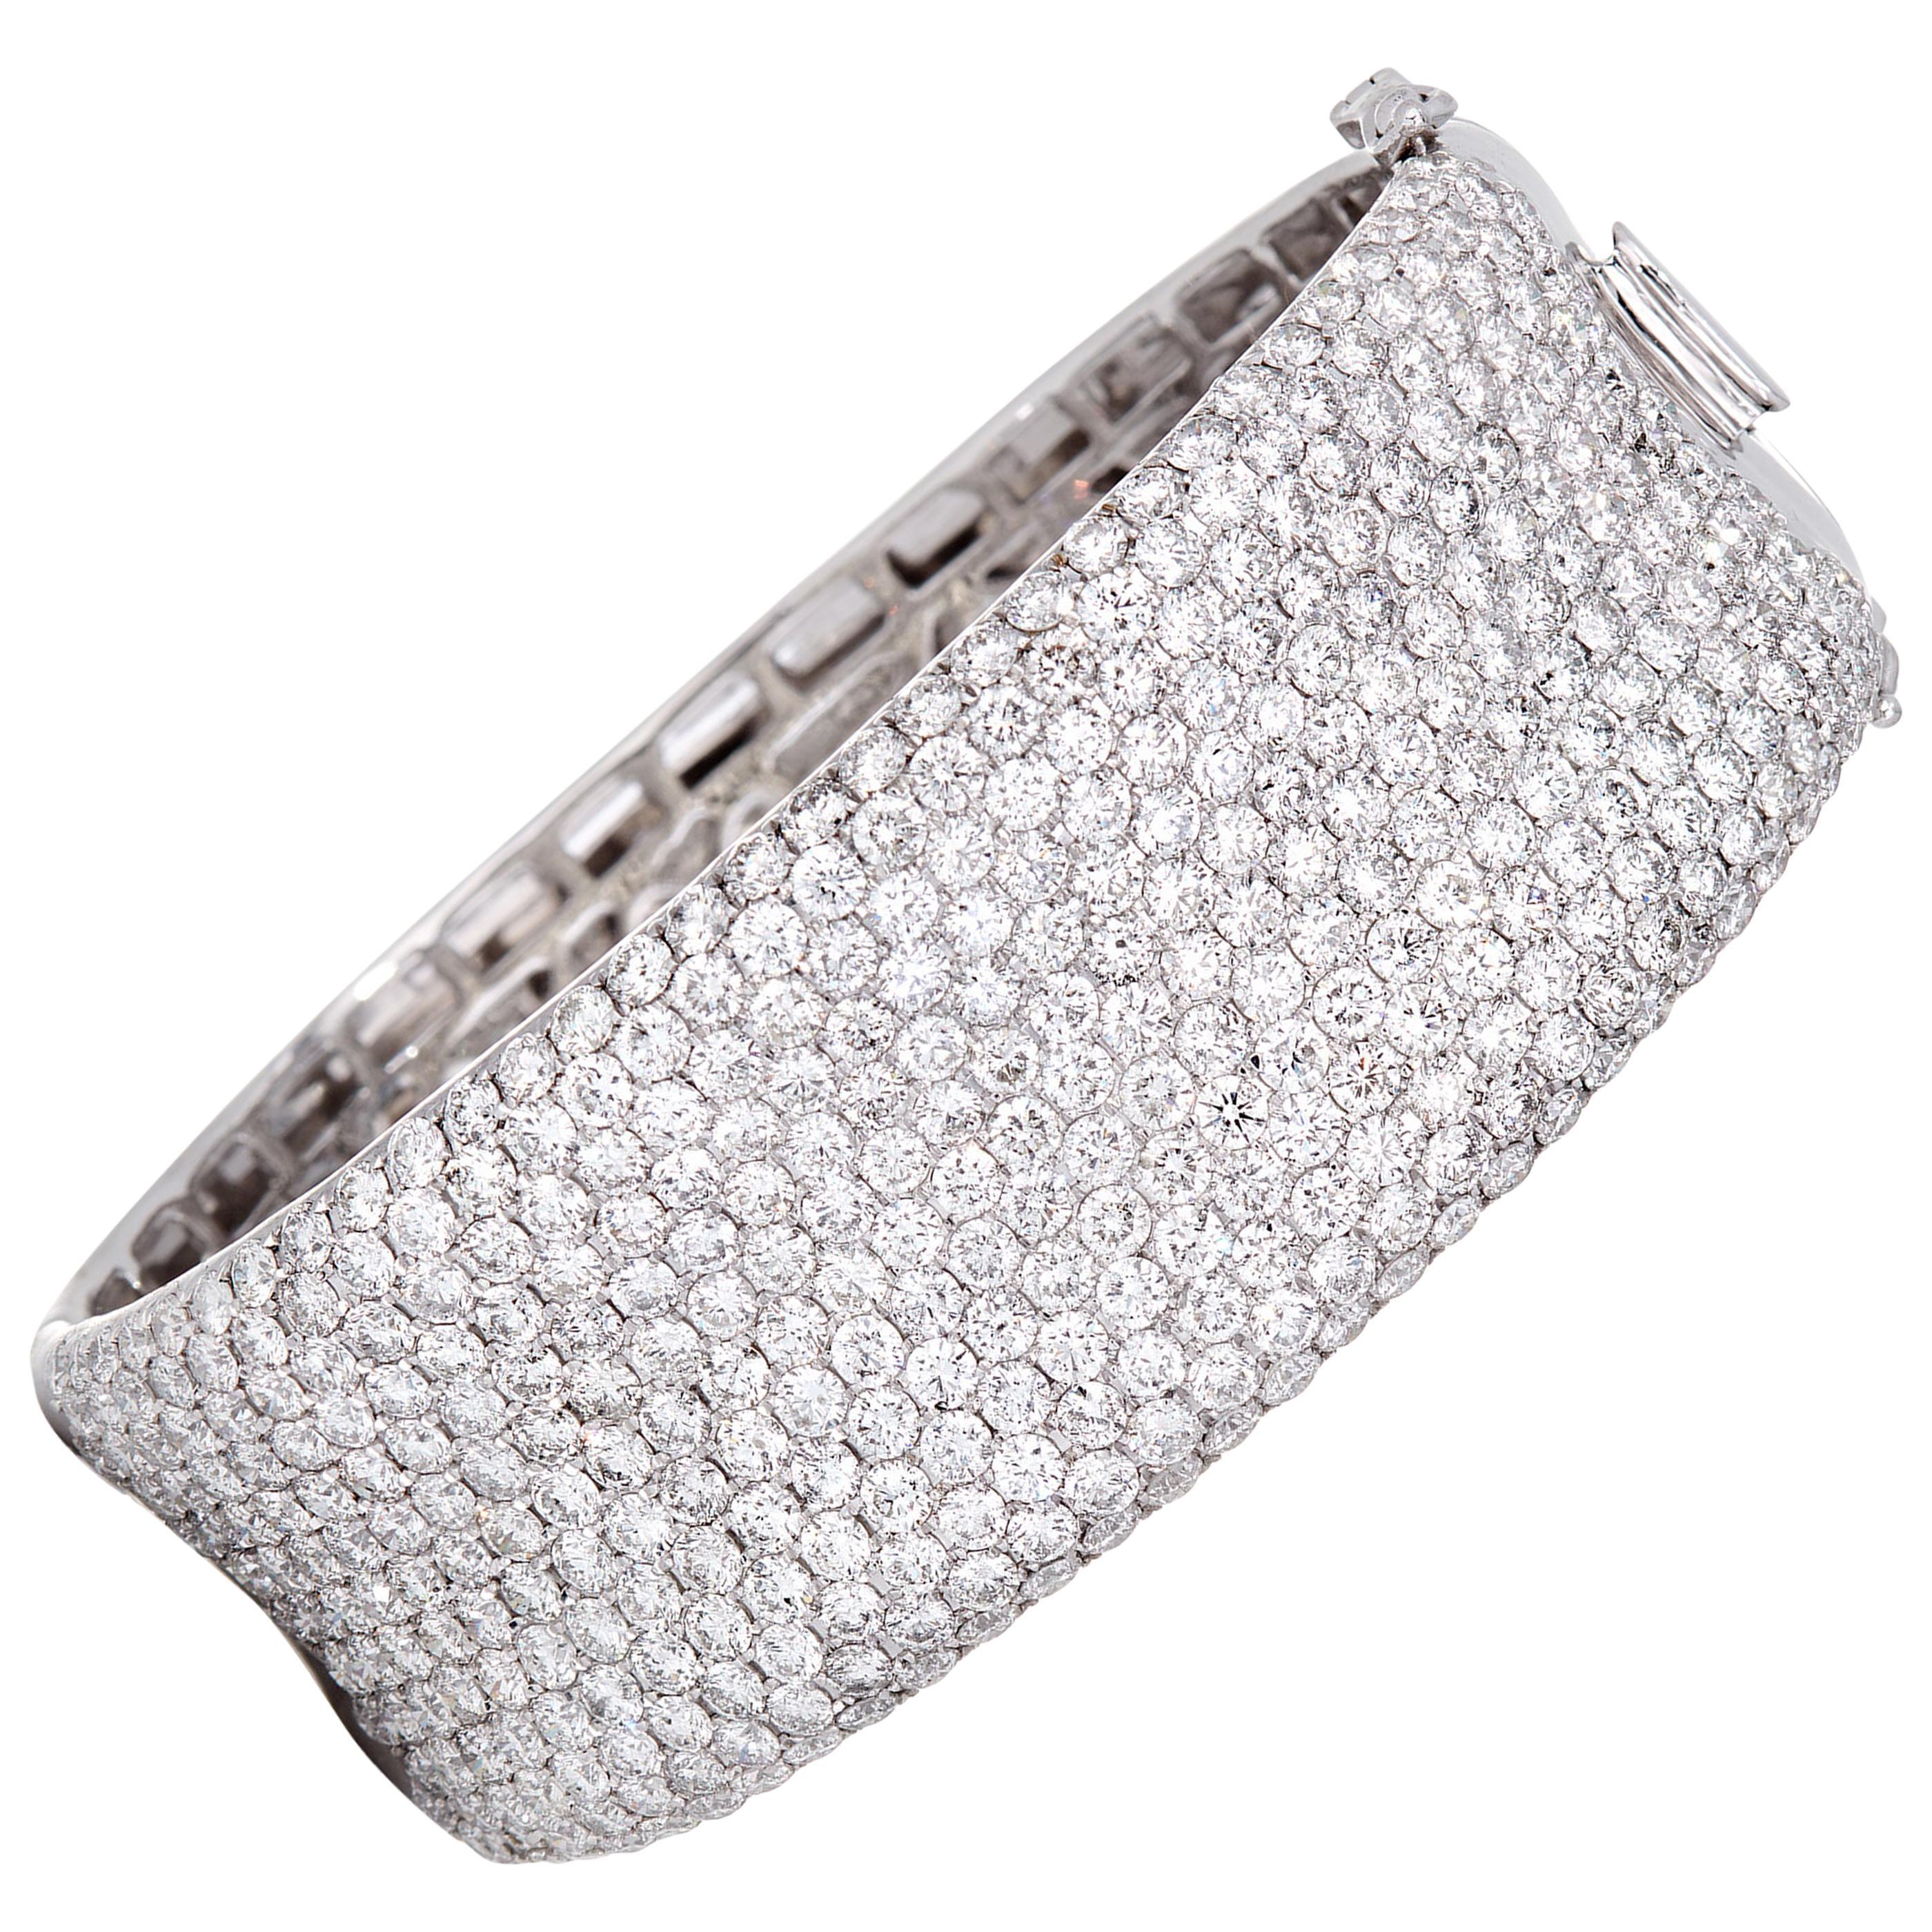 20.90 Carat Diamond Wide Cuff Bracelet in 18 Karat White Gold